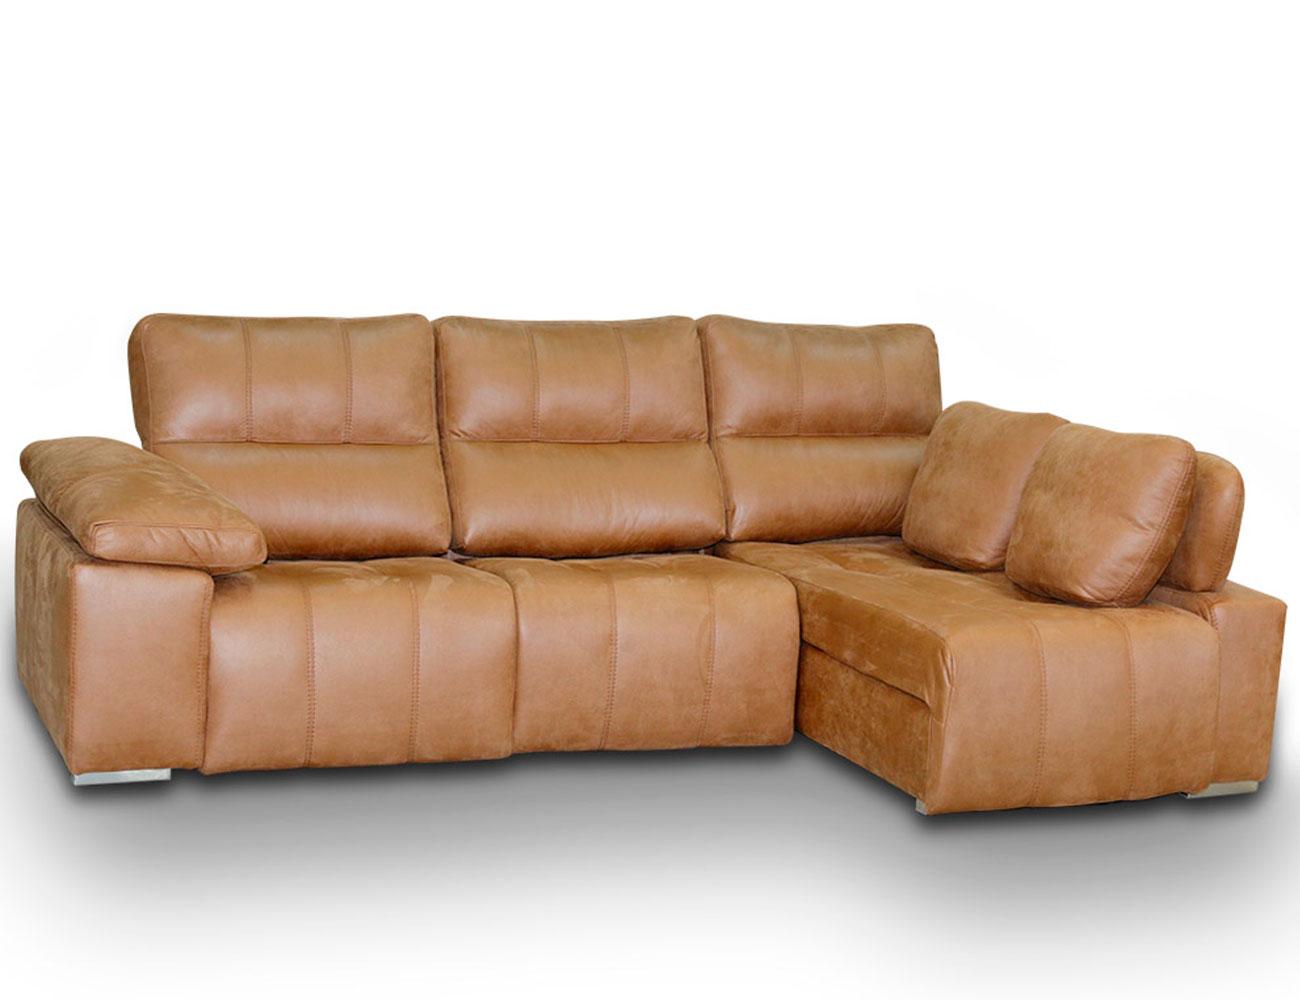 Sofa chaiselongue relax 2 motores anti manchas23